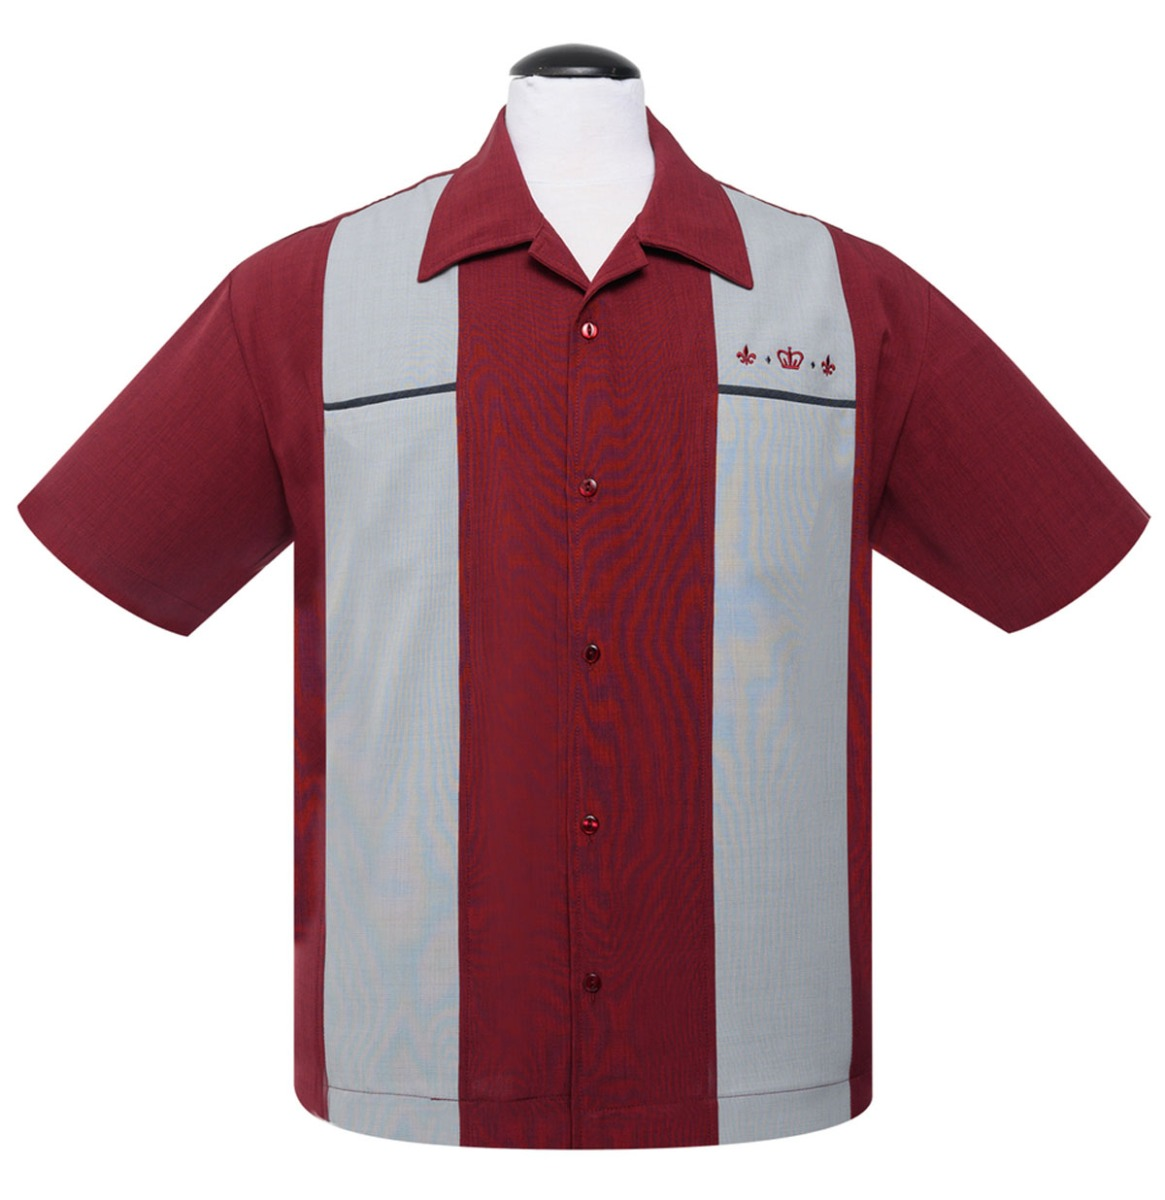 The Regal Shirt Burgundy